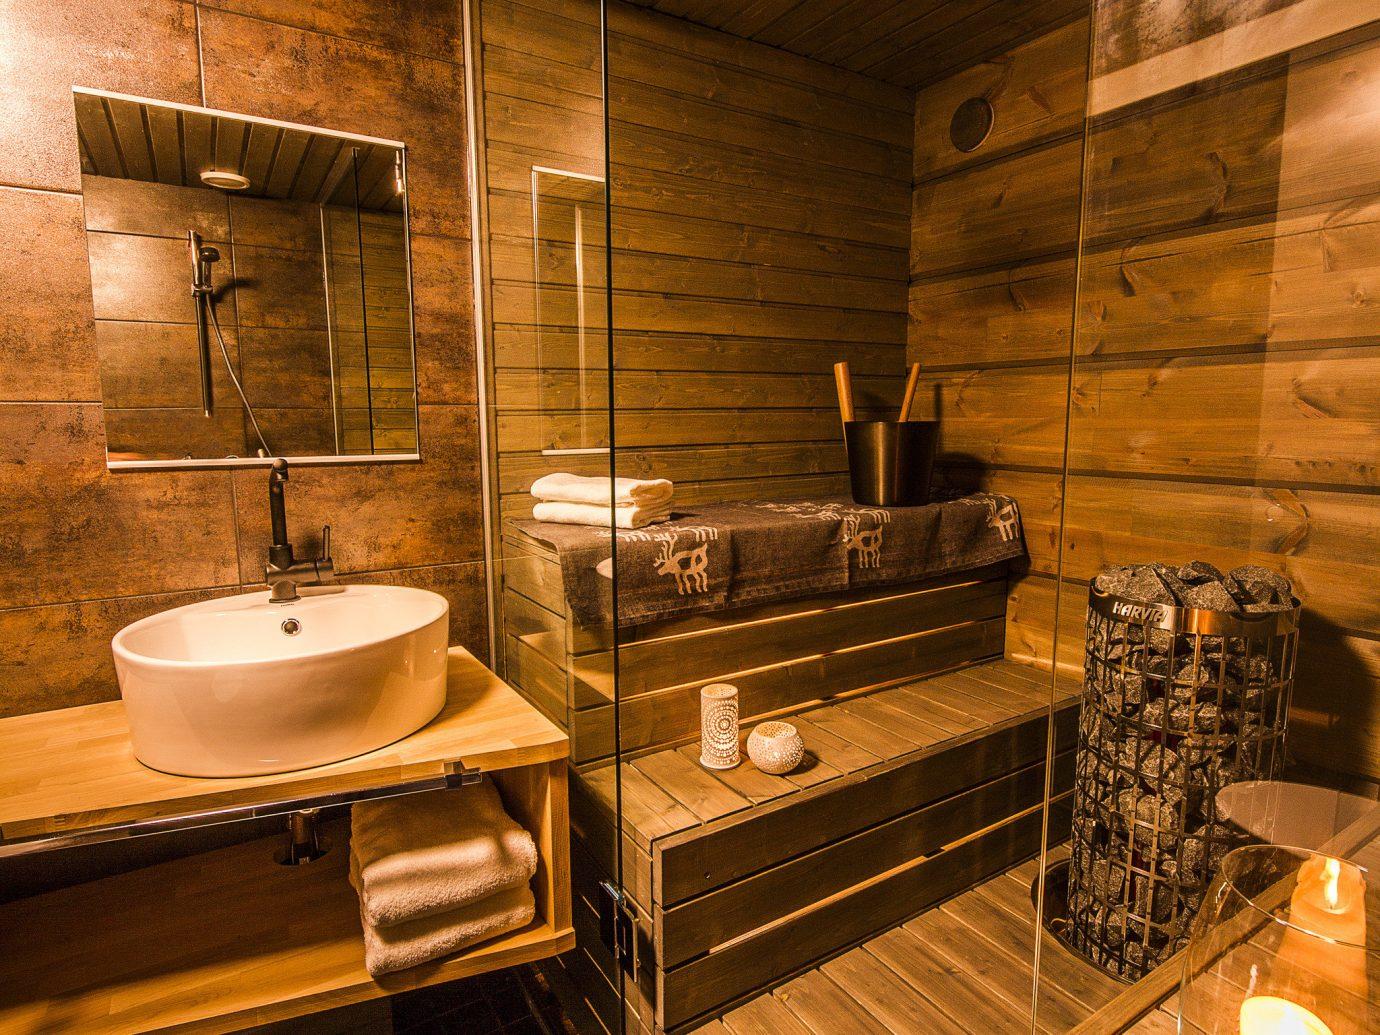 Finland Trip Ideas indoor floor room Architecture interior design bathroom wood sink flooring estate tile tiled